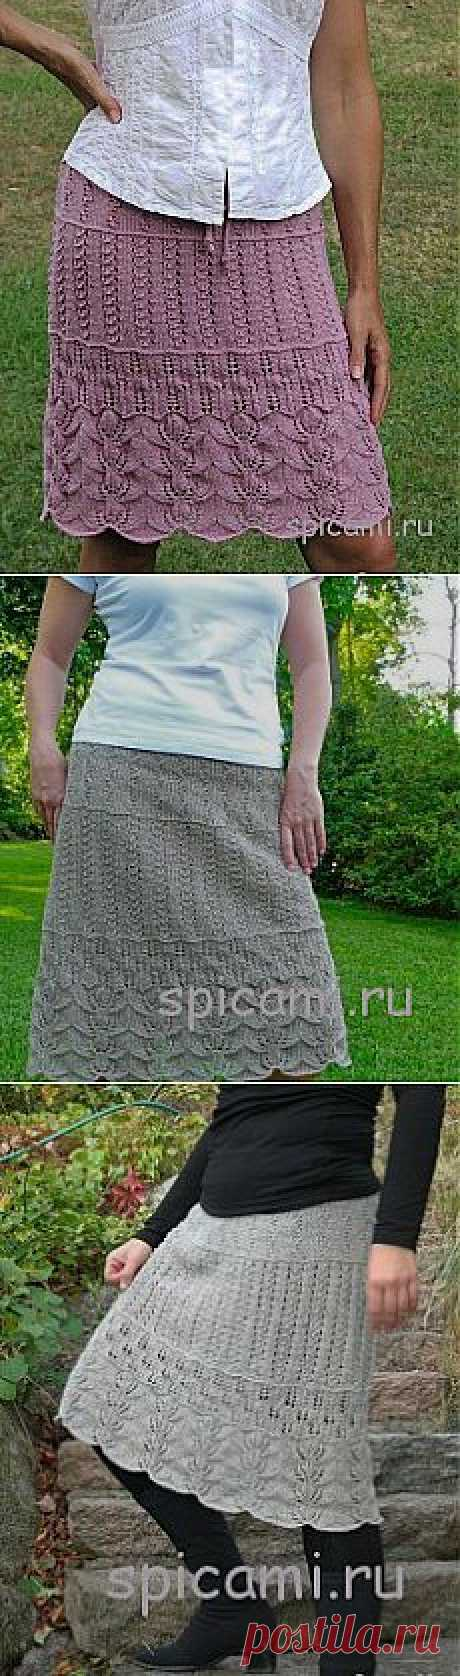 Ажурная многослойная юбка спицами.